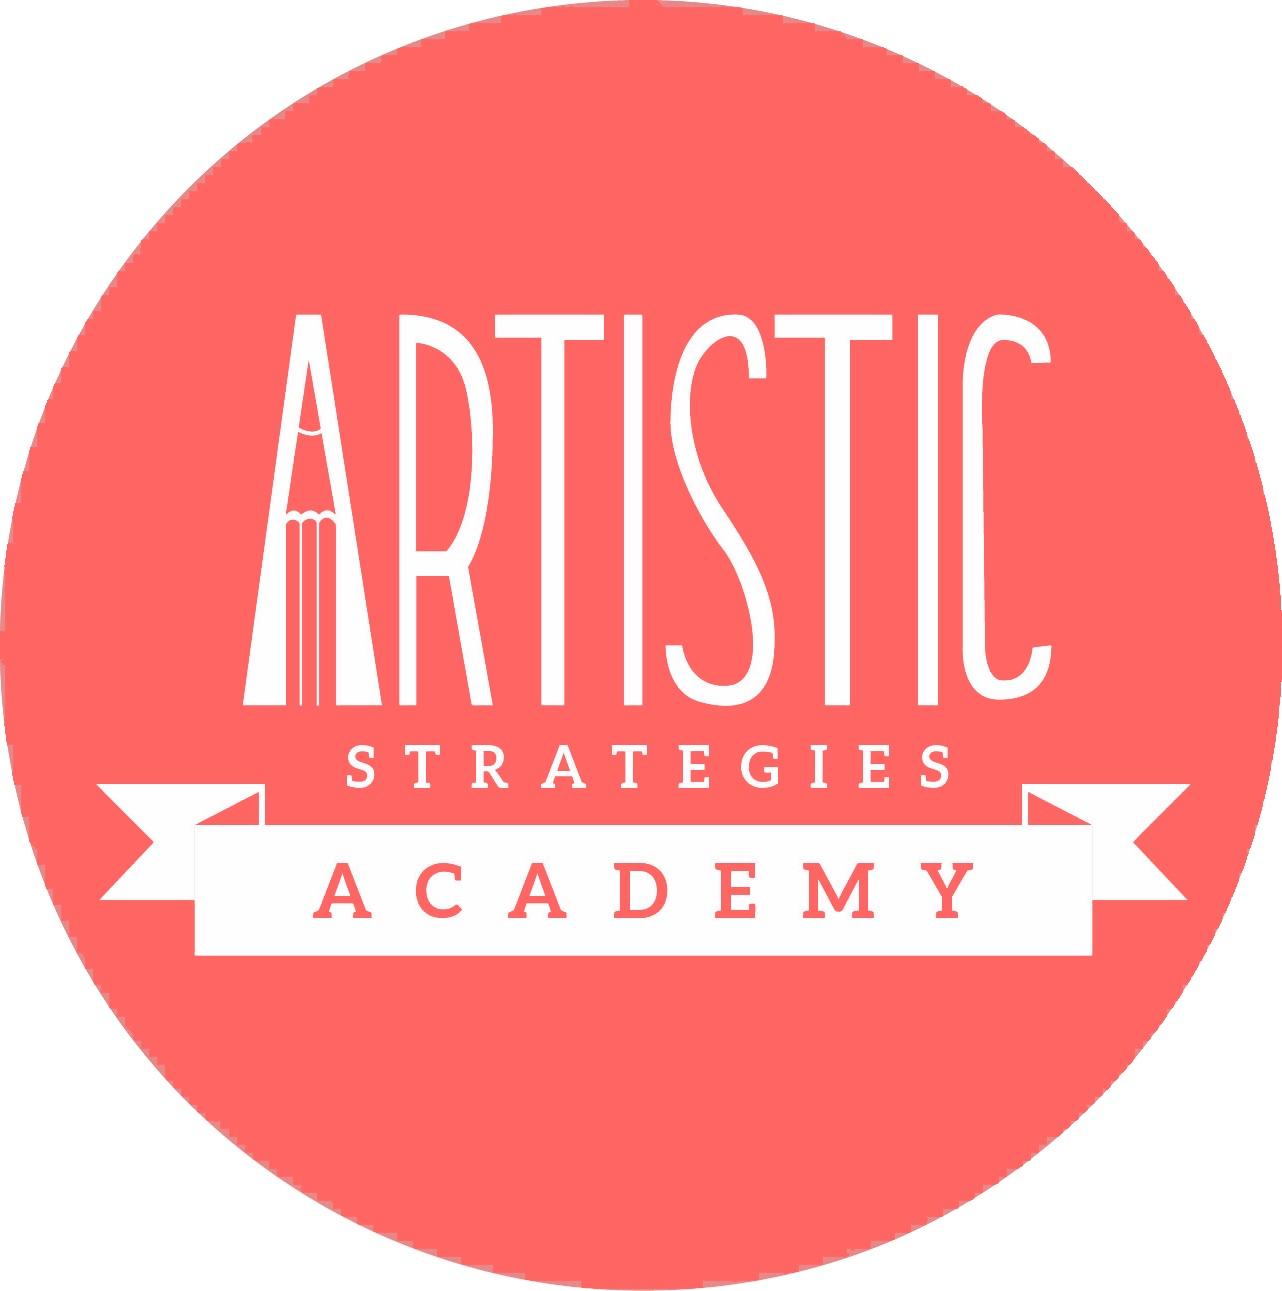 Artistic Strategies Academy